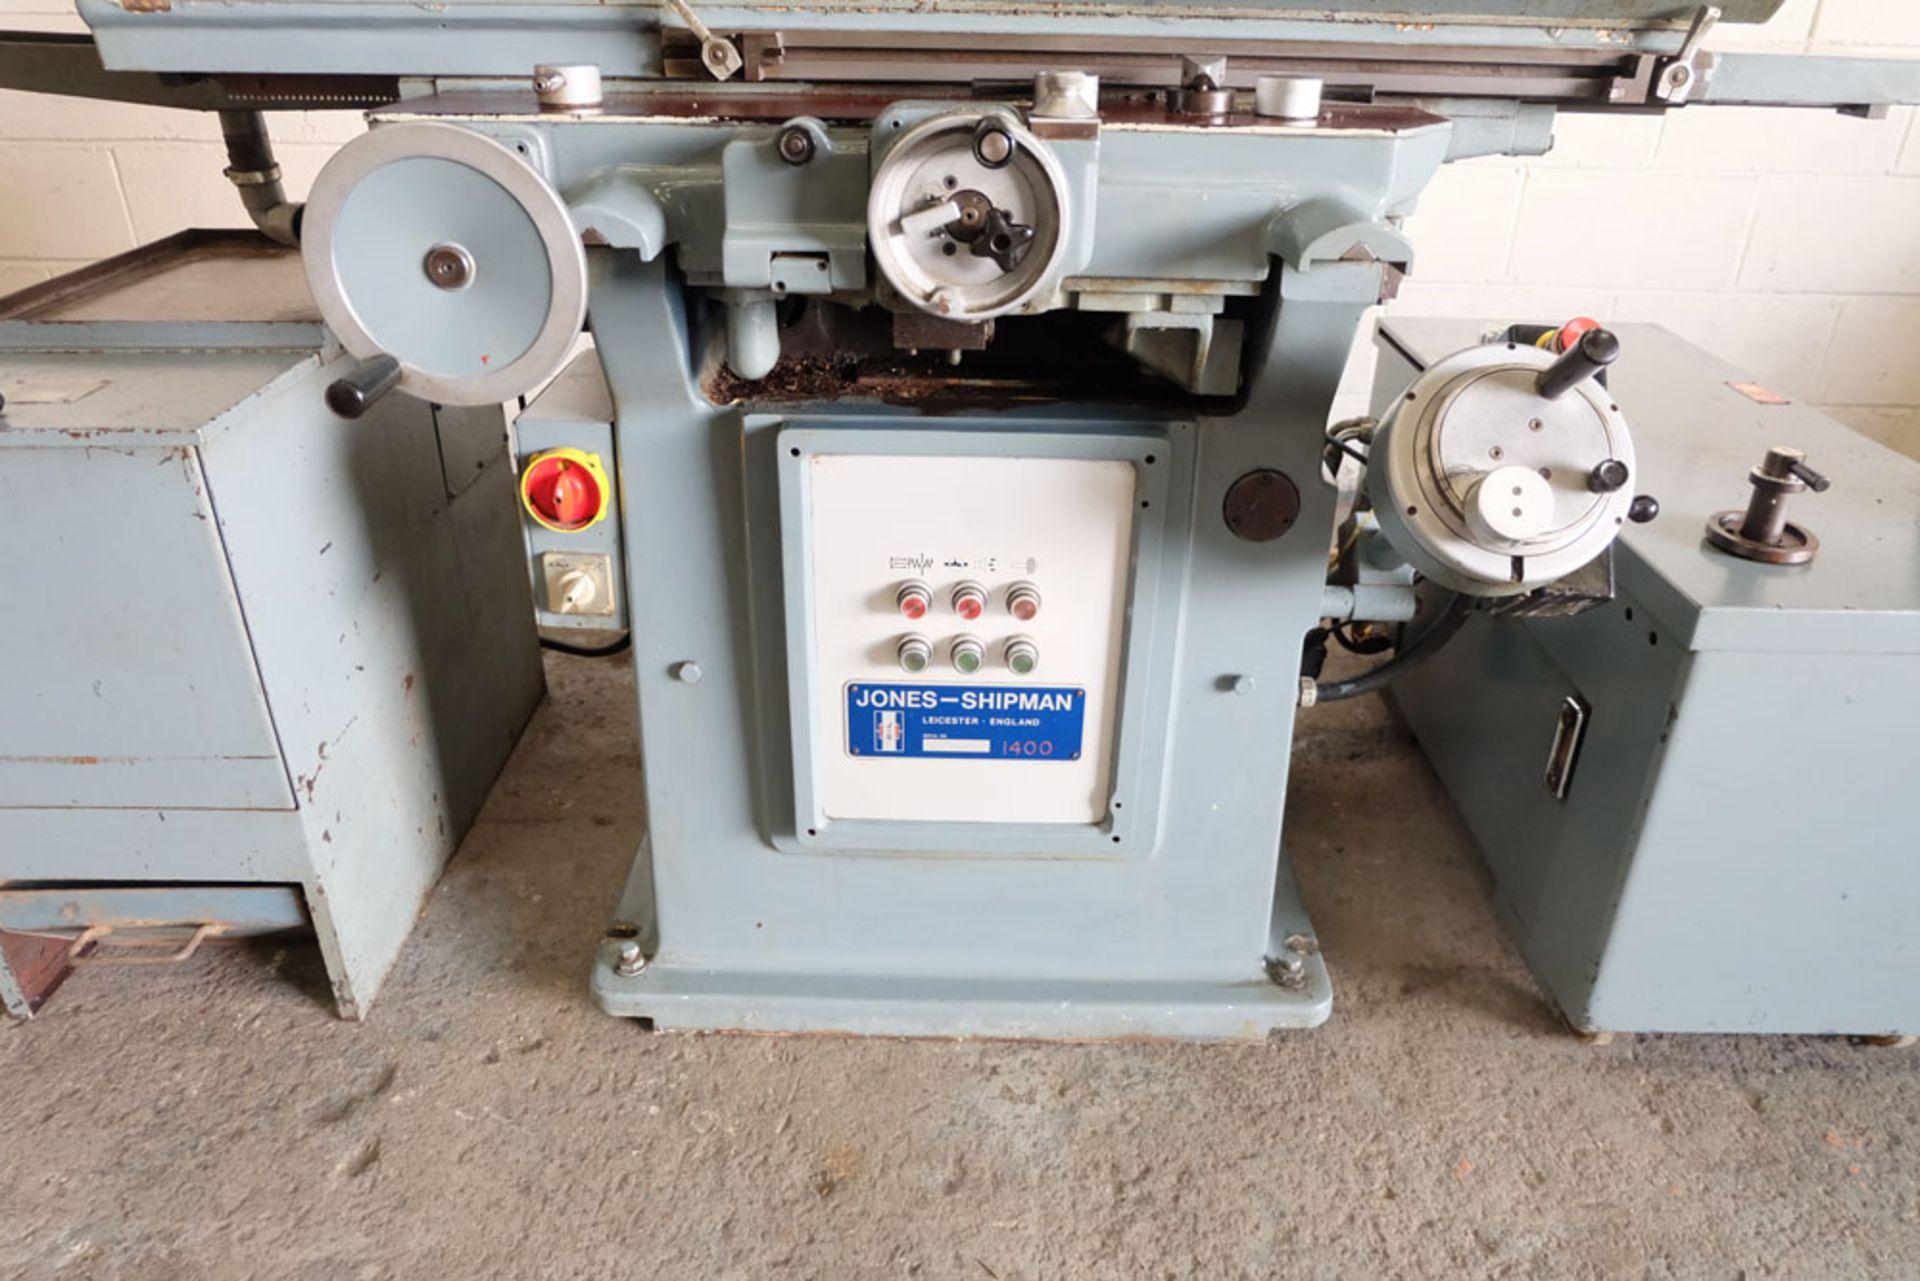 Jones & Shipman 1400P Toolroom Surface Grinder. - Image 6 of 13